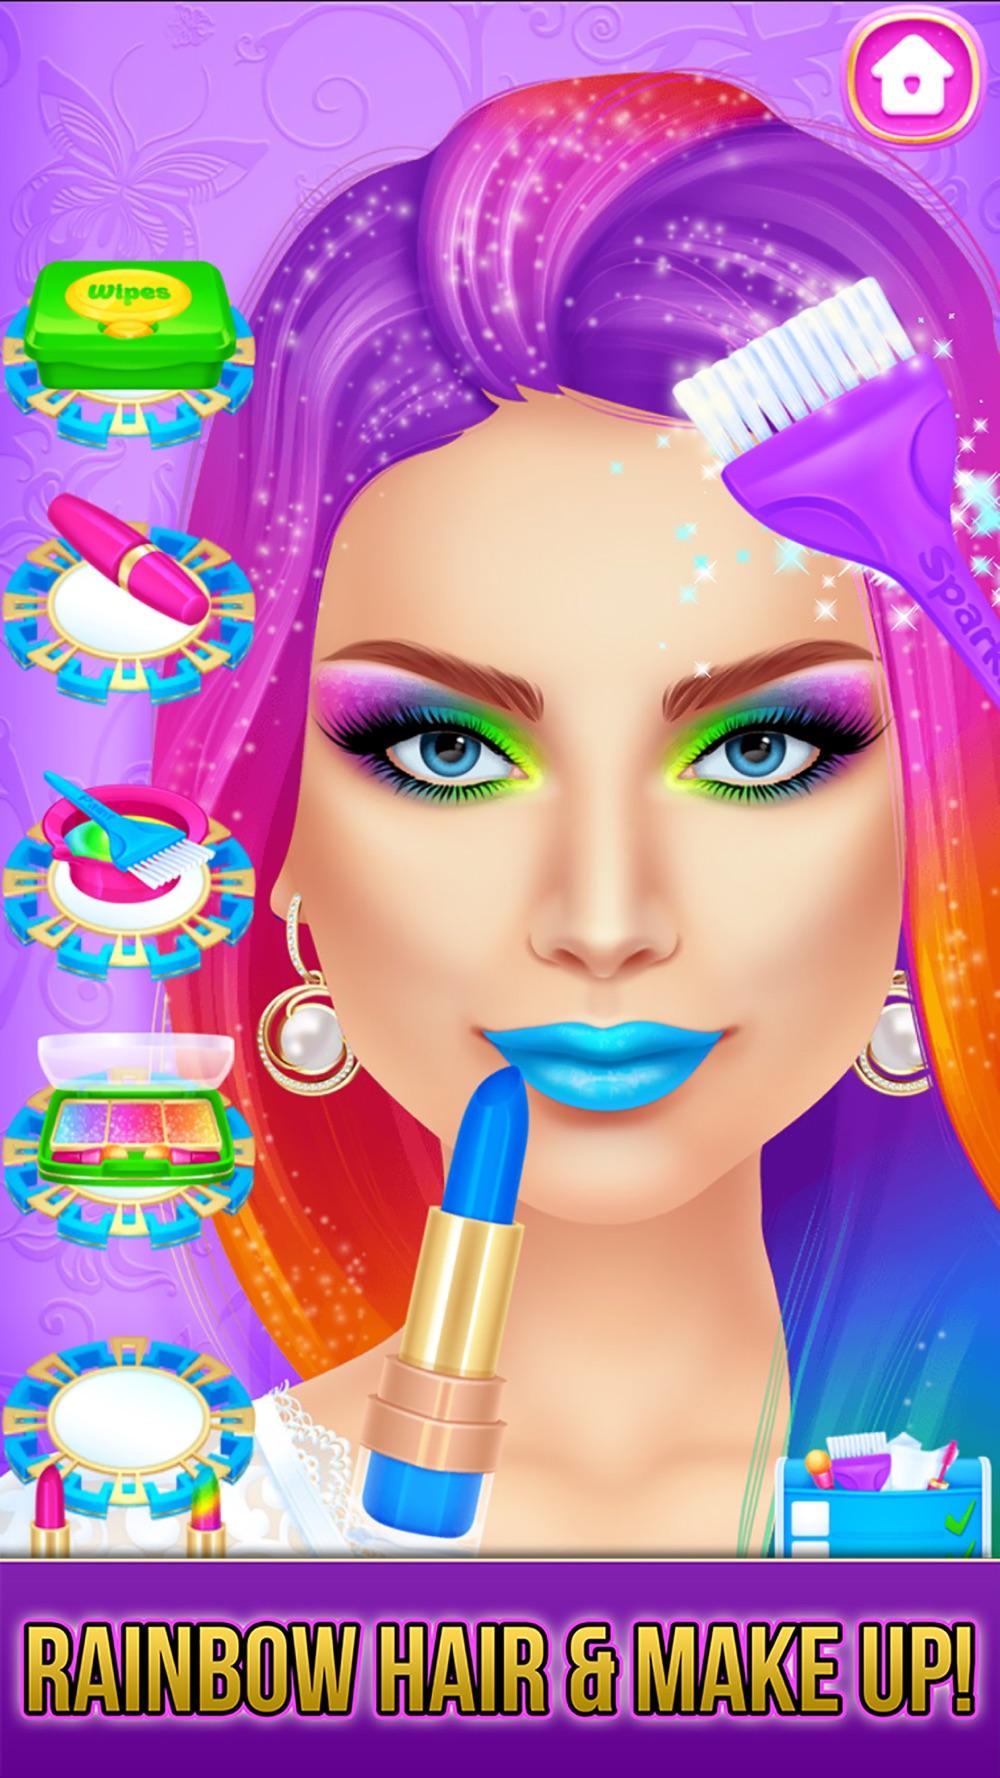 Make Up & Hair Salon Makeover hack tool